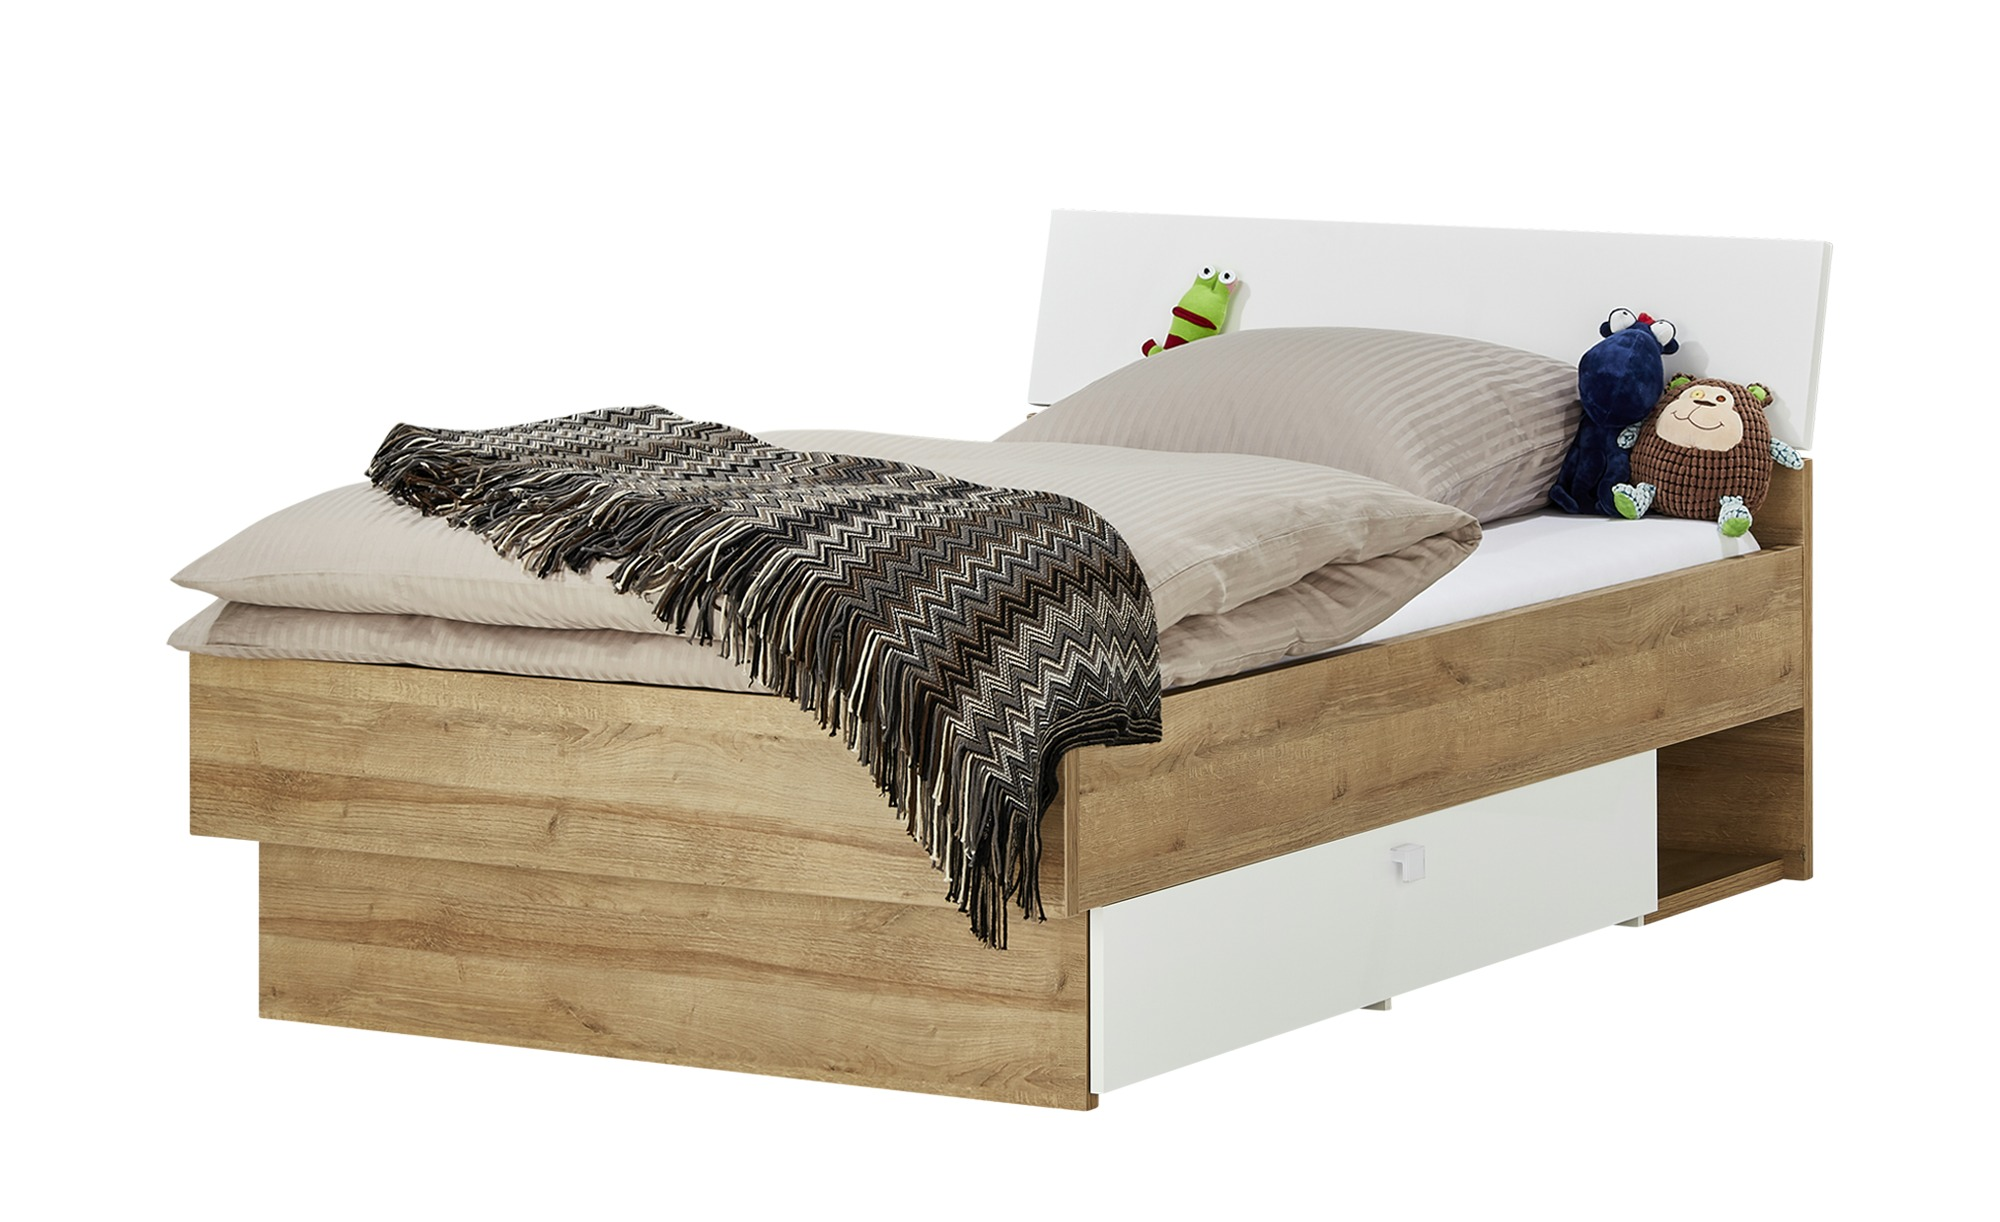 Full Size of Bett 120x200 Cm Bei Mbel Kraft Online Kaufen 160x200 Betten Frankfurt 200x200 Komforthöhe Massiv 180x200 Mit Bettkasten 140x200 überlänge Ottoversand Bett Bett 120x200